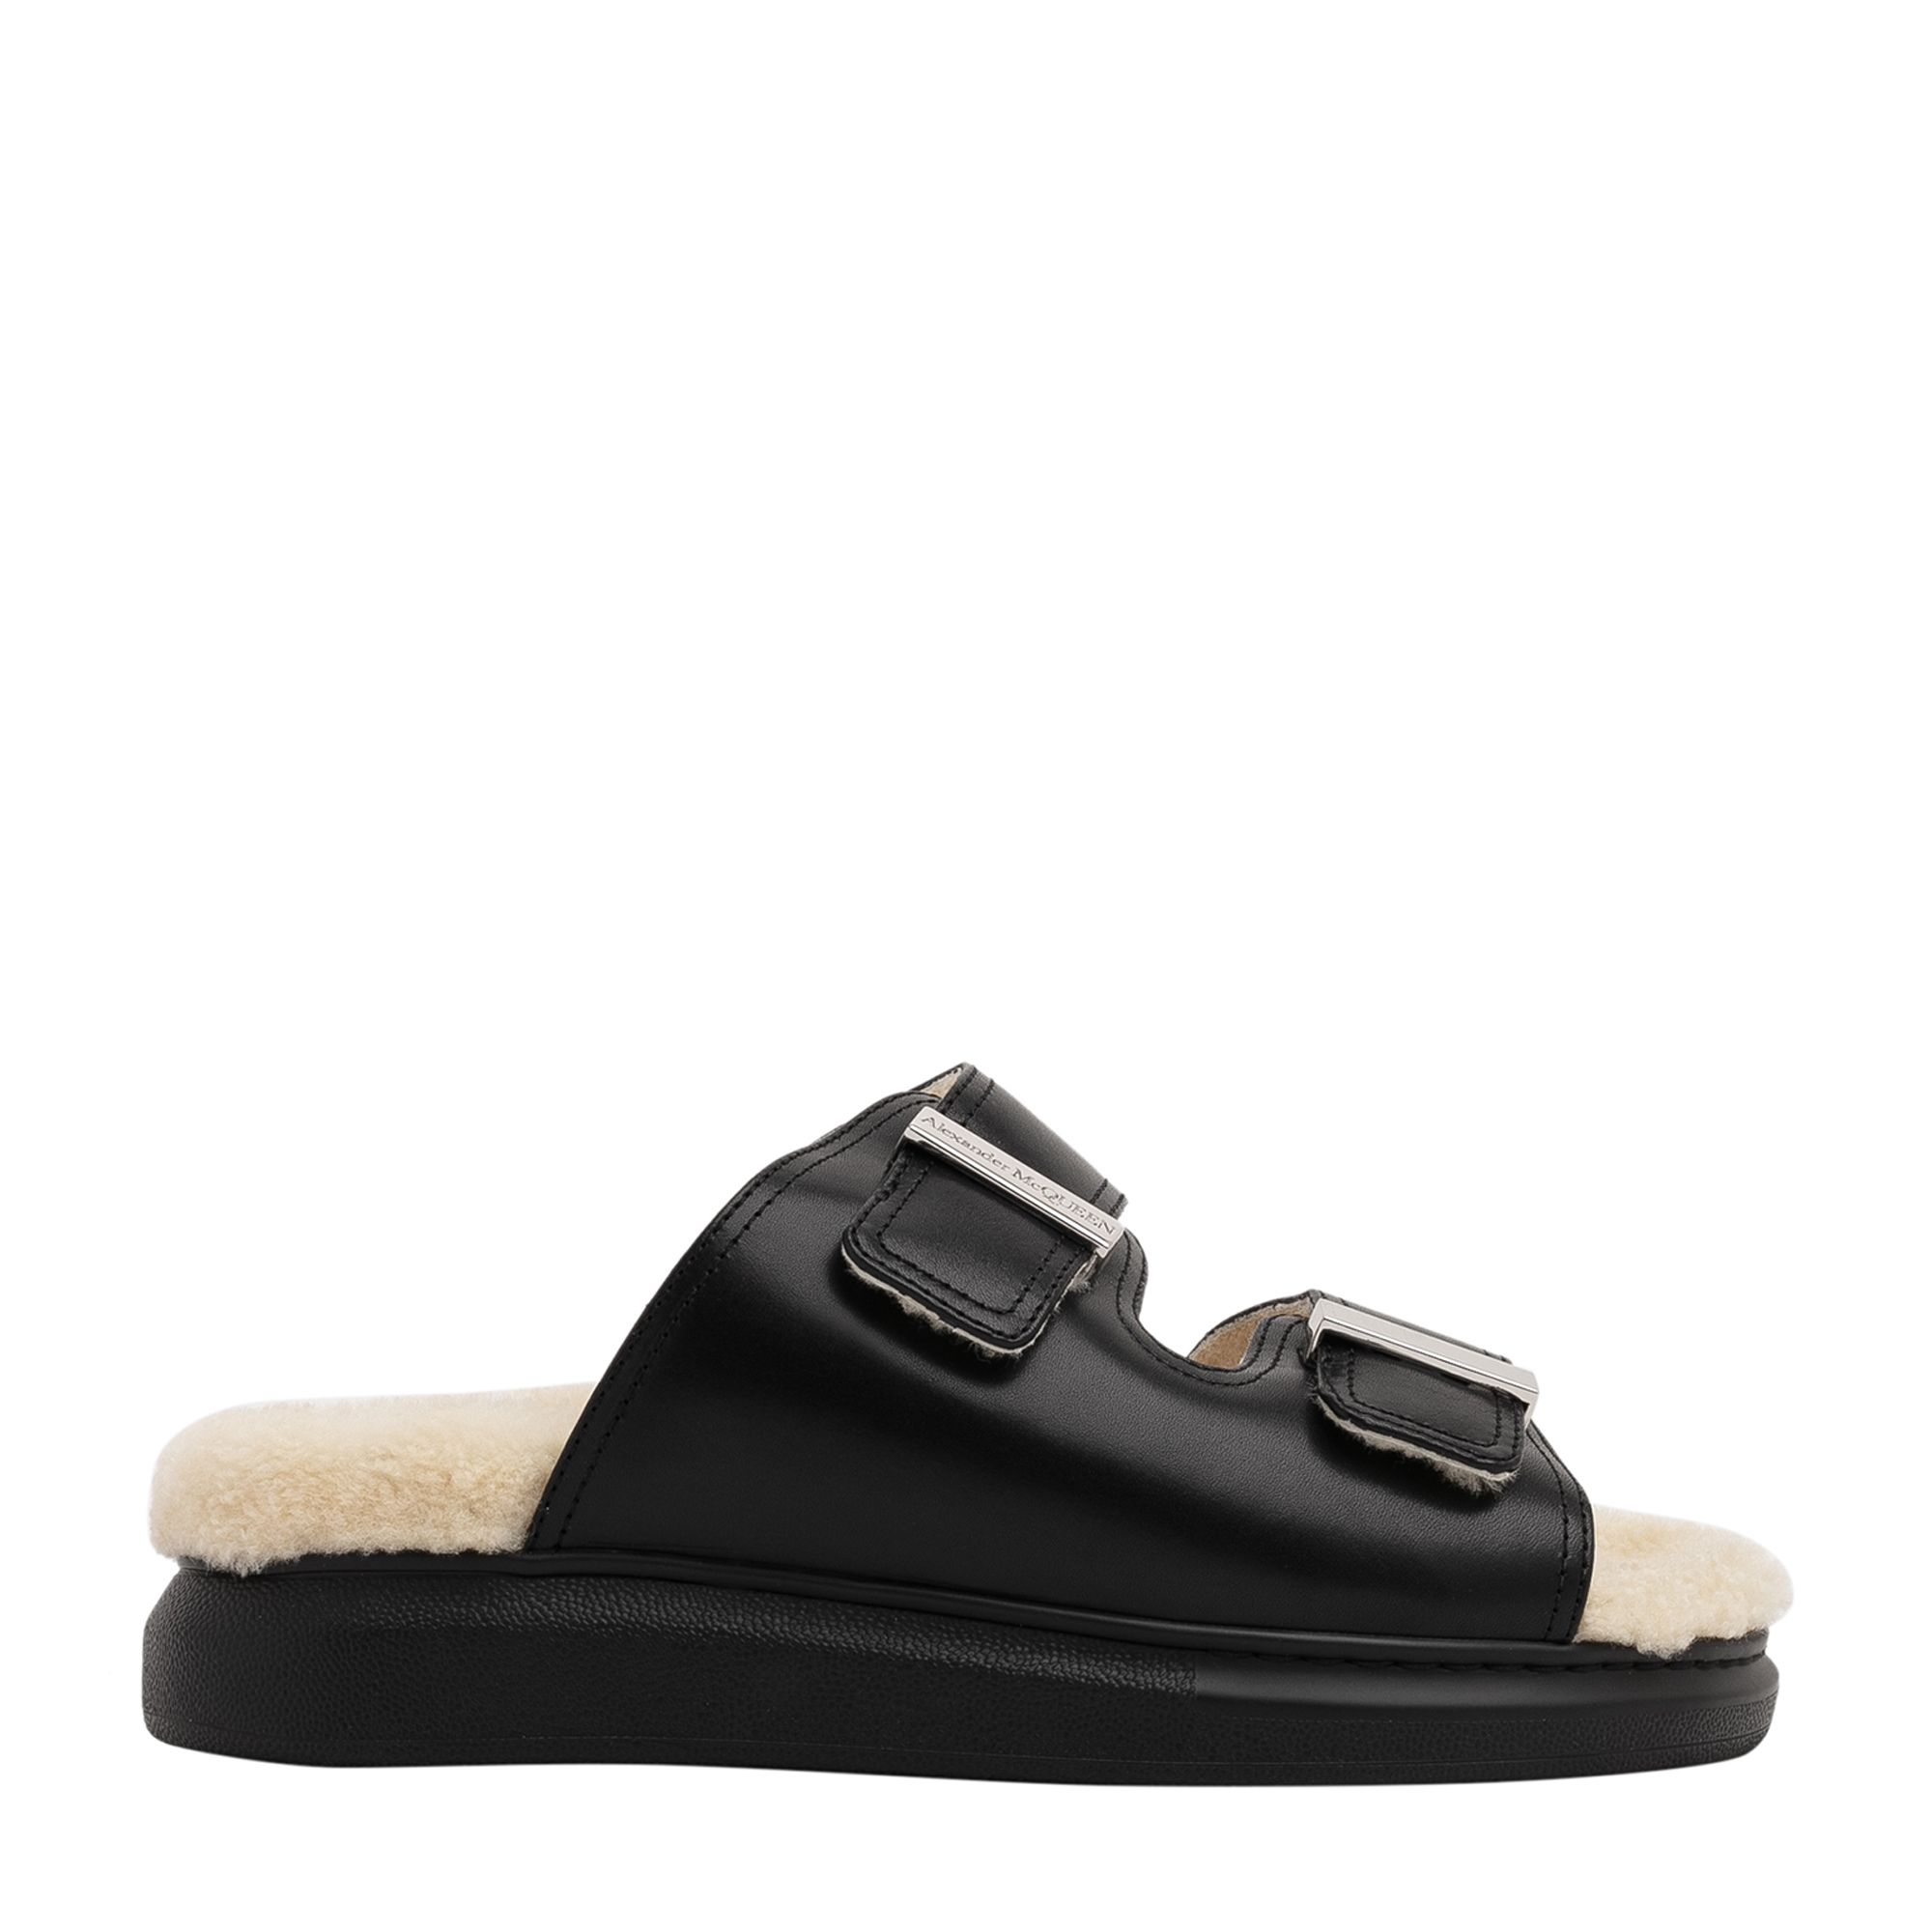 Hybrid slide sandals